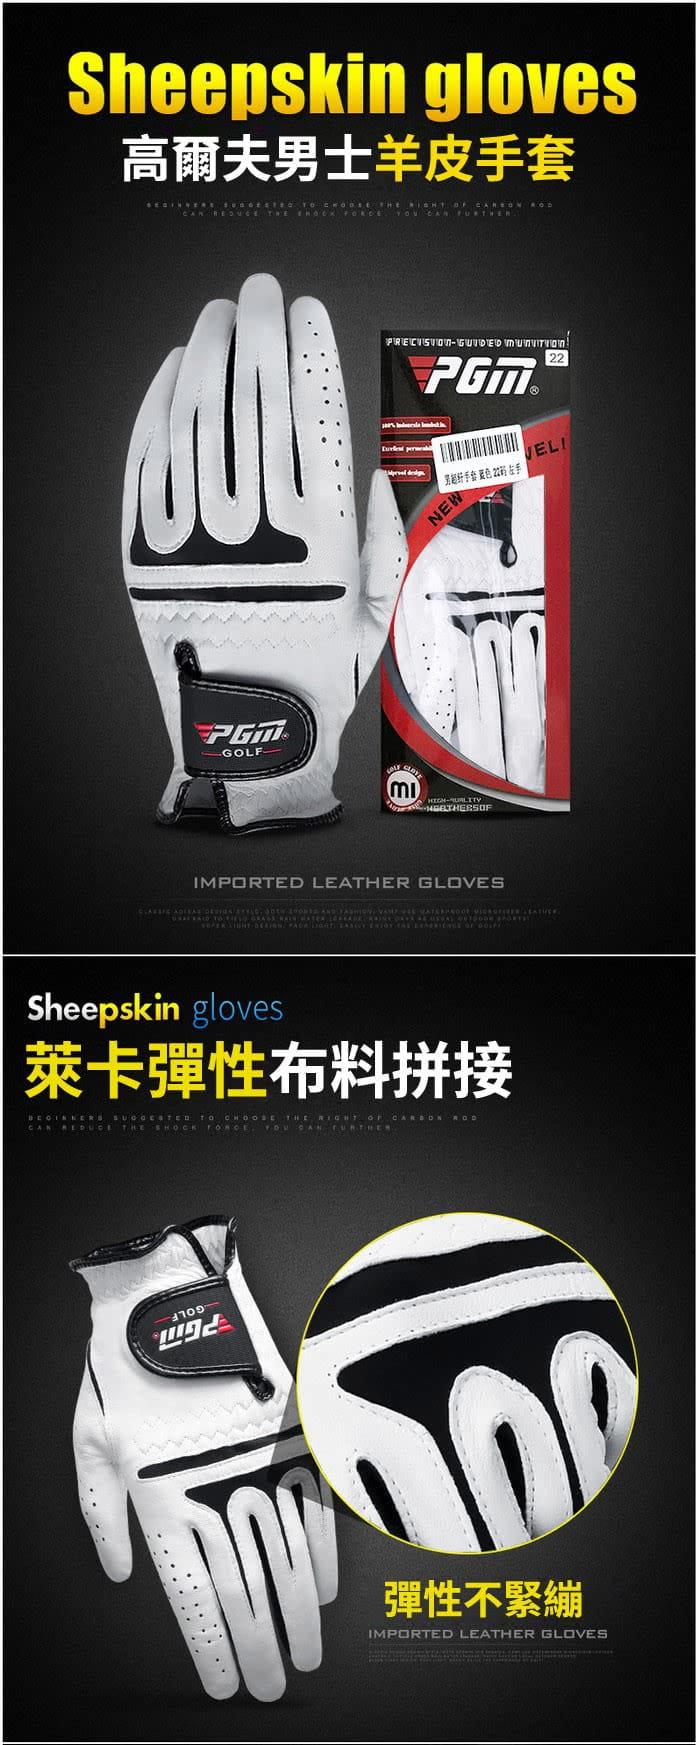 【PGM】高爾夫 男士 羊皮手套 配戴右手 一隻裝(高爾夫球 手套) 1